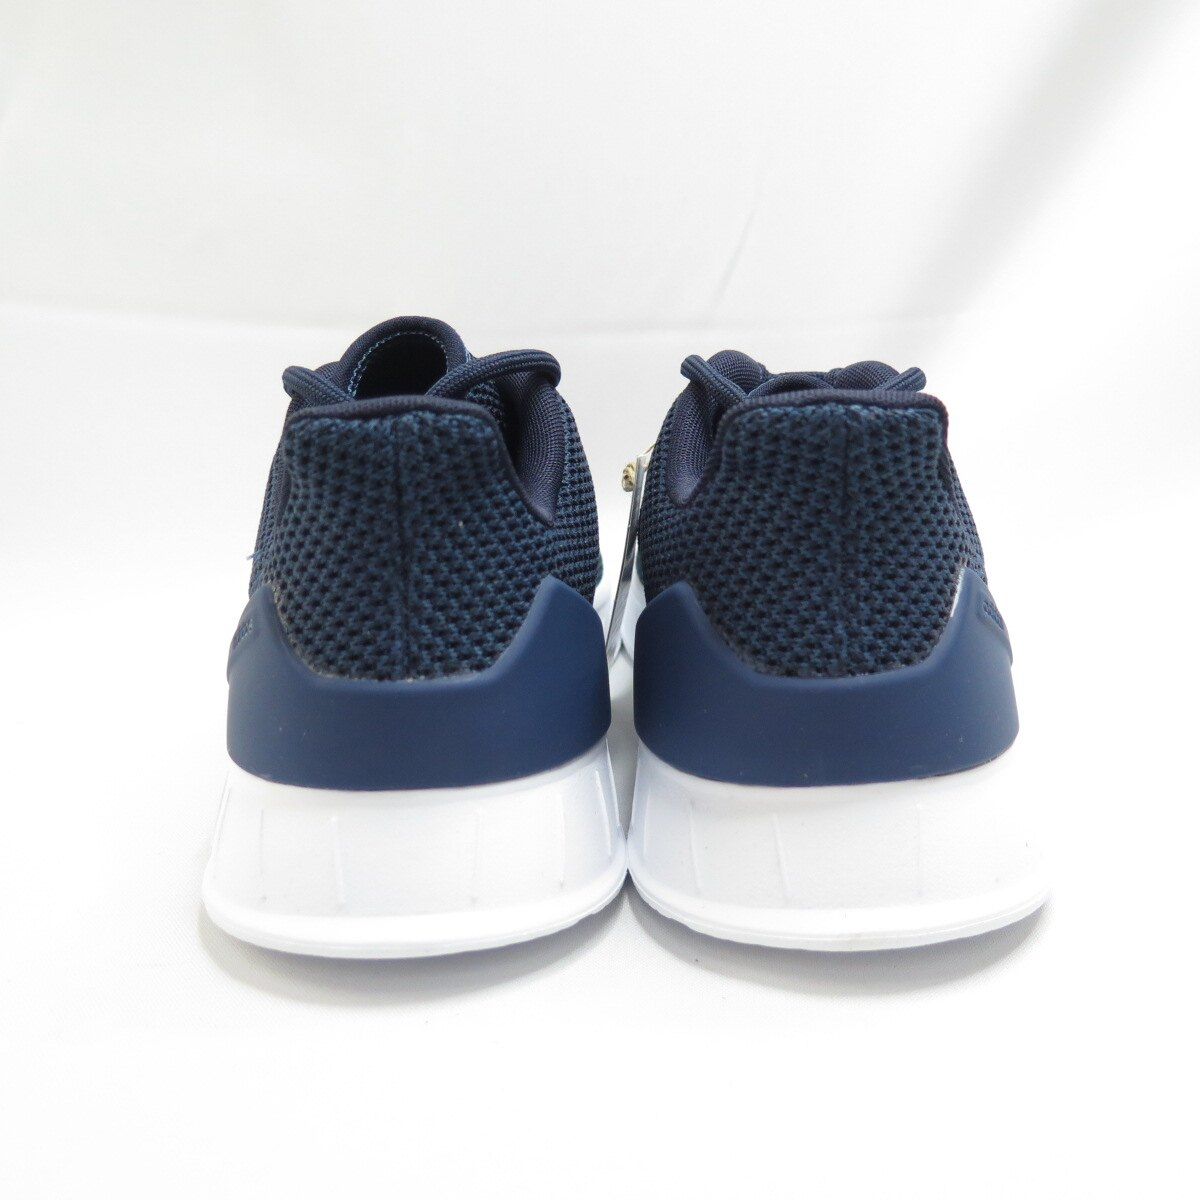 ADIDAS QUESTAR FLOW NX 男款 慢跑鞋 運動鞋 FY9561 深藍【iSport愛運動】